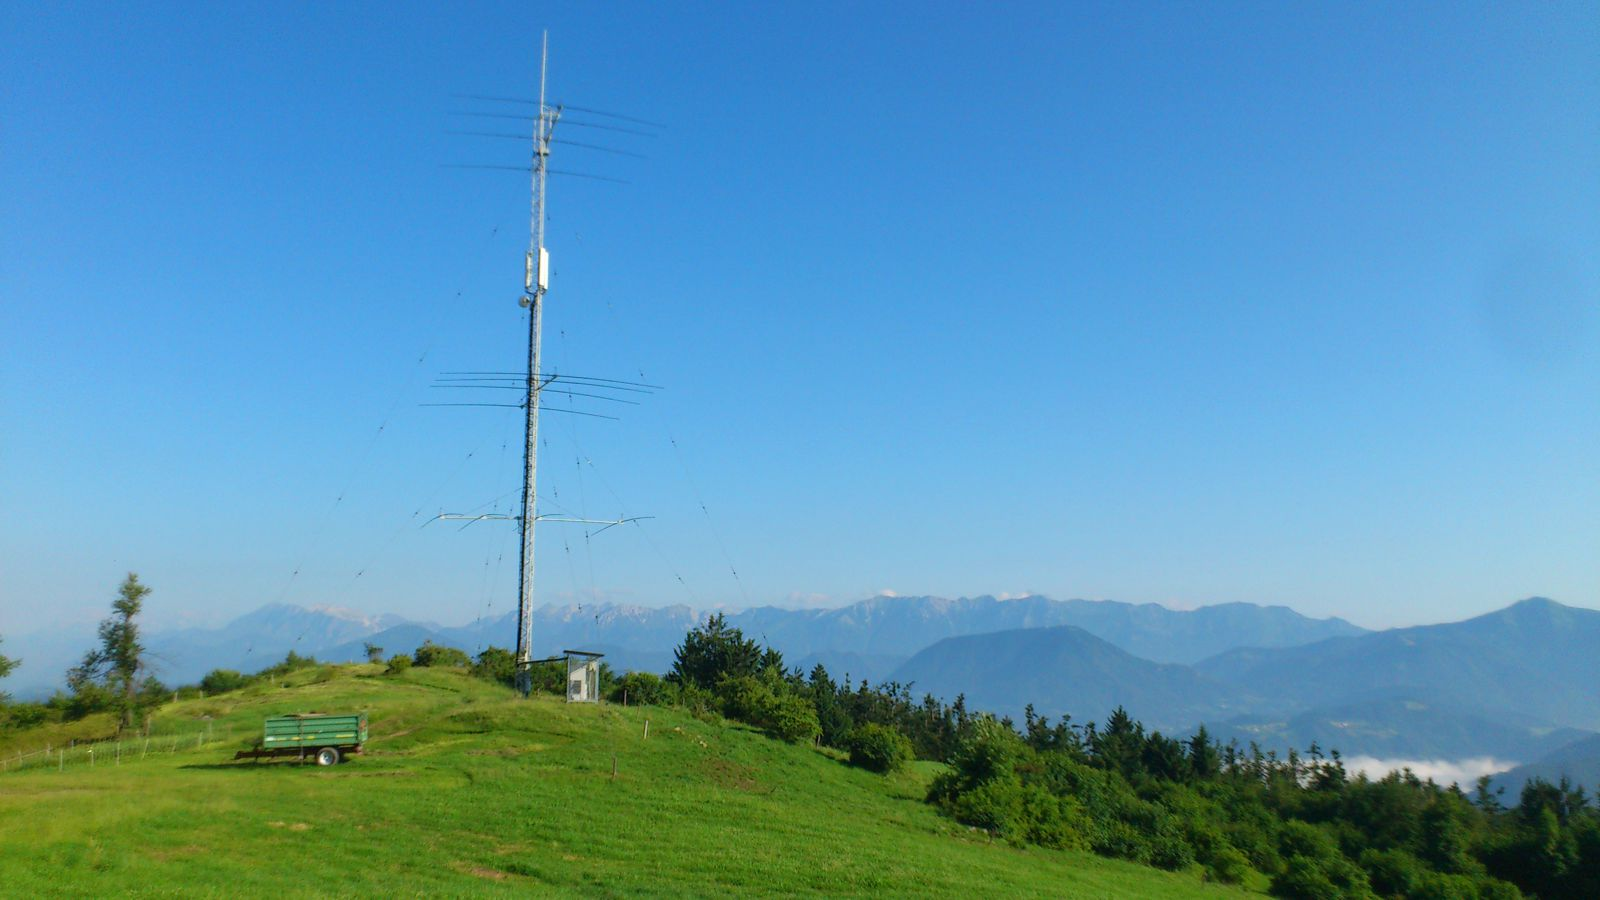 S50HQ 2016 KAL 14 MHz SSB STATION